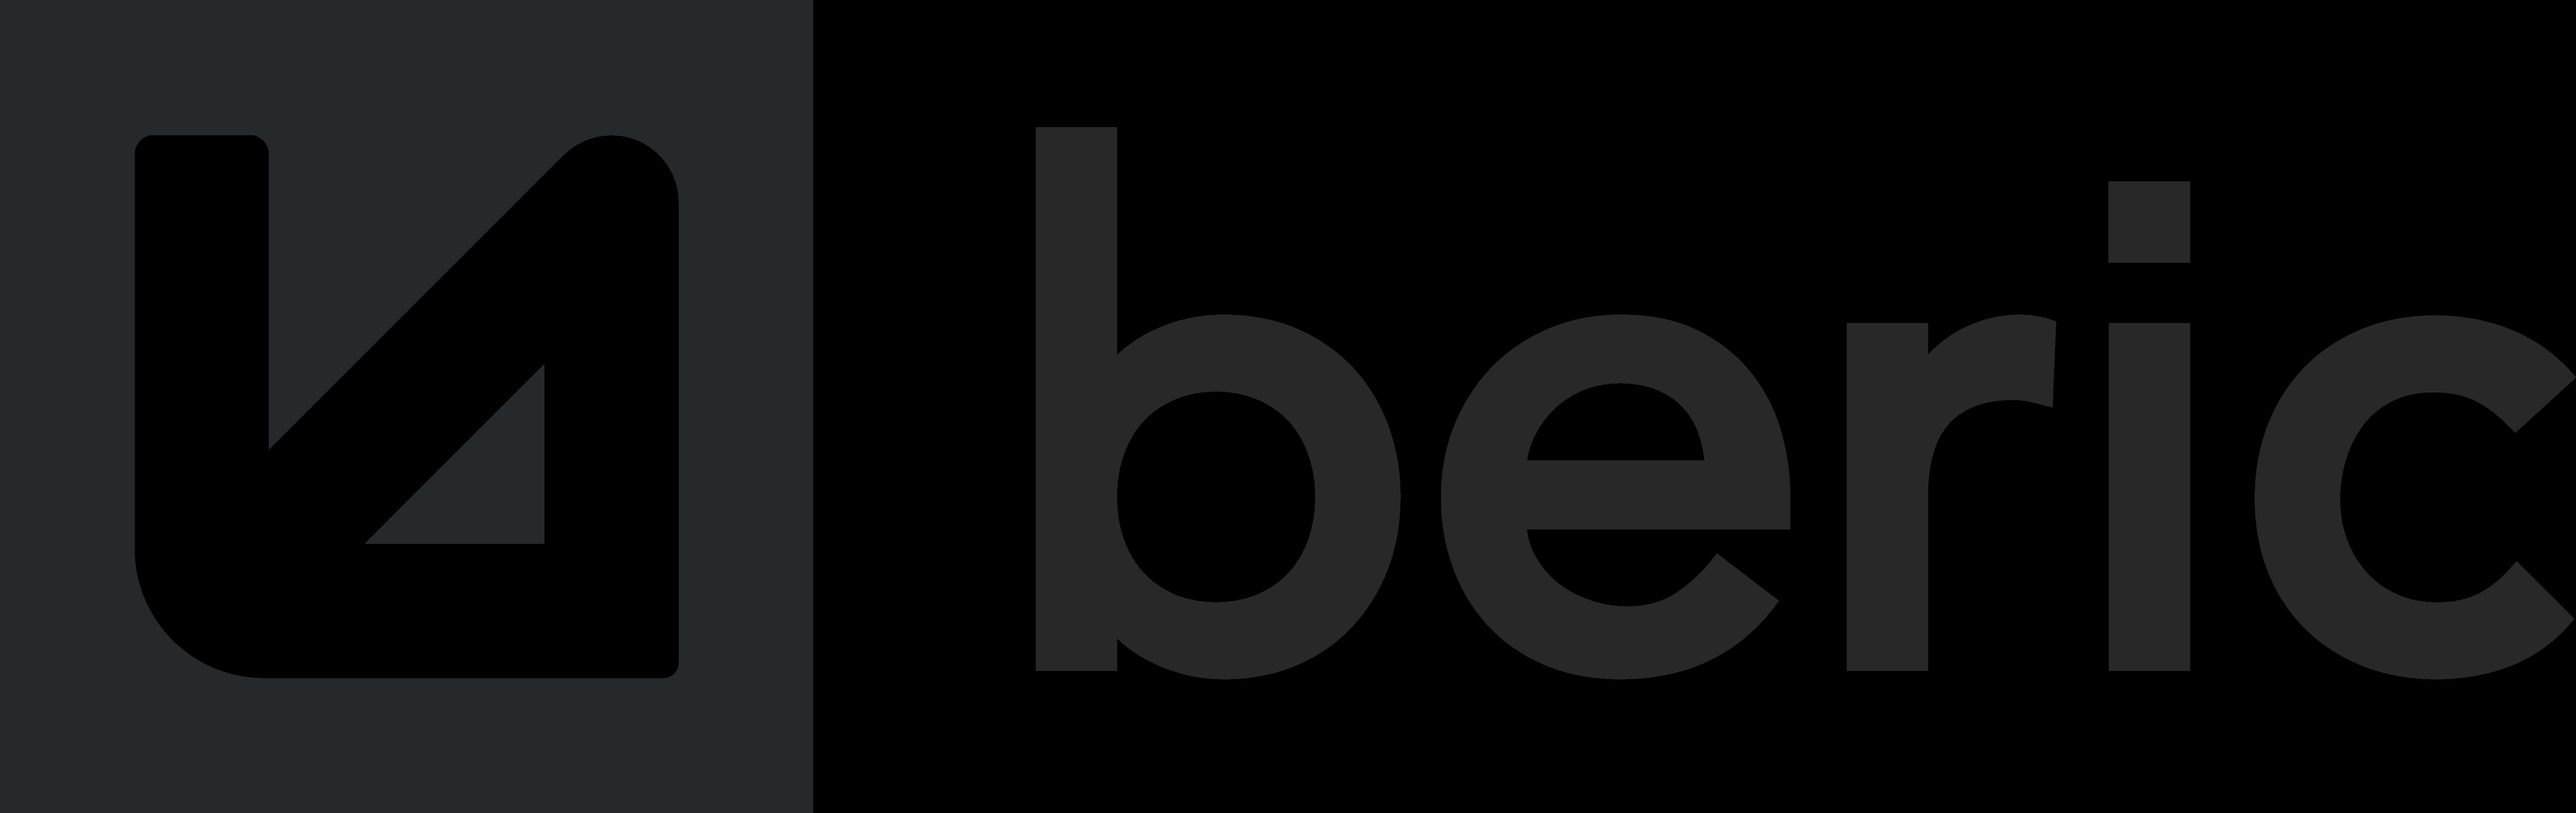 Beric